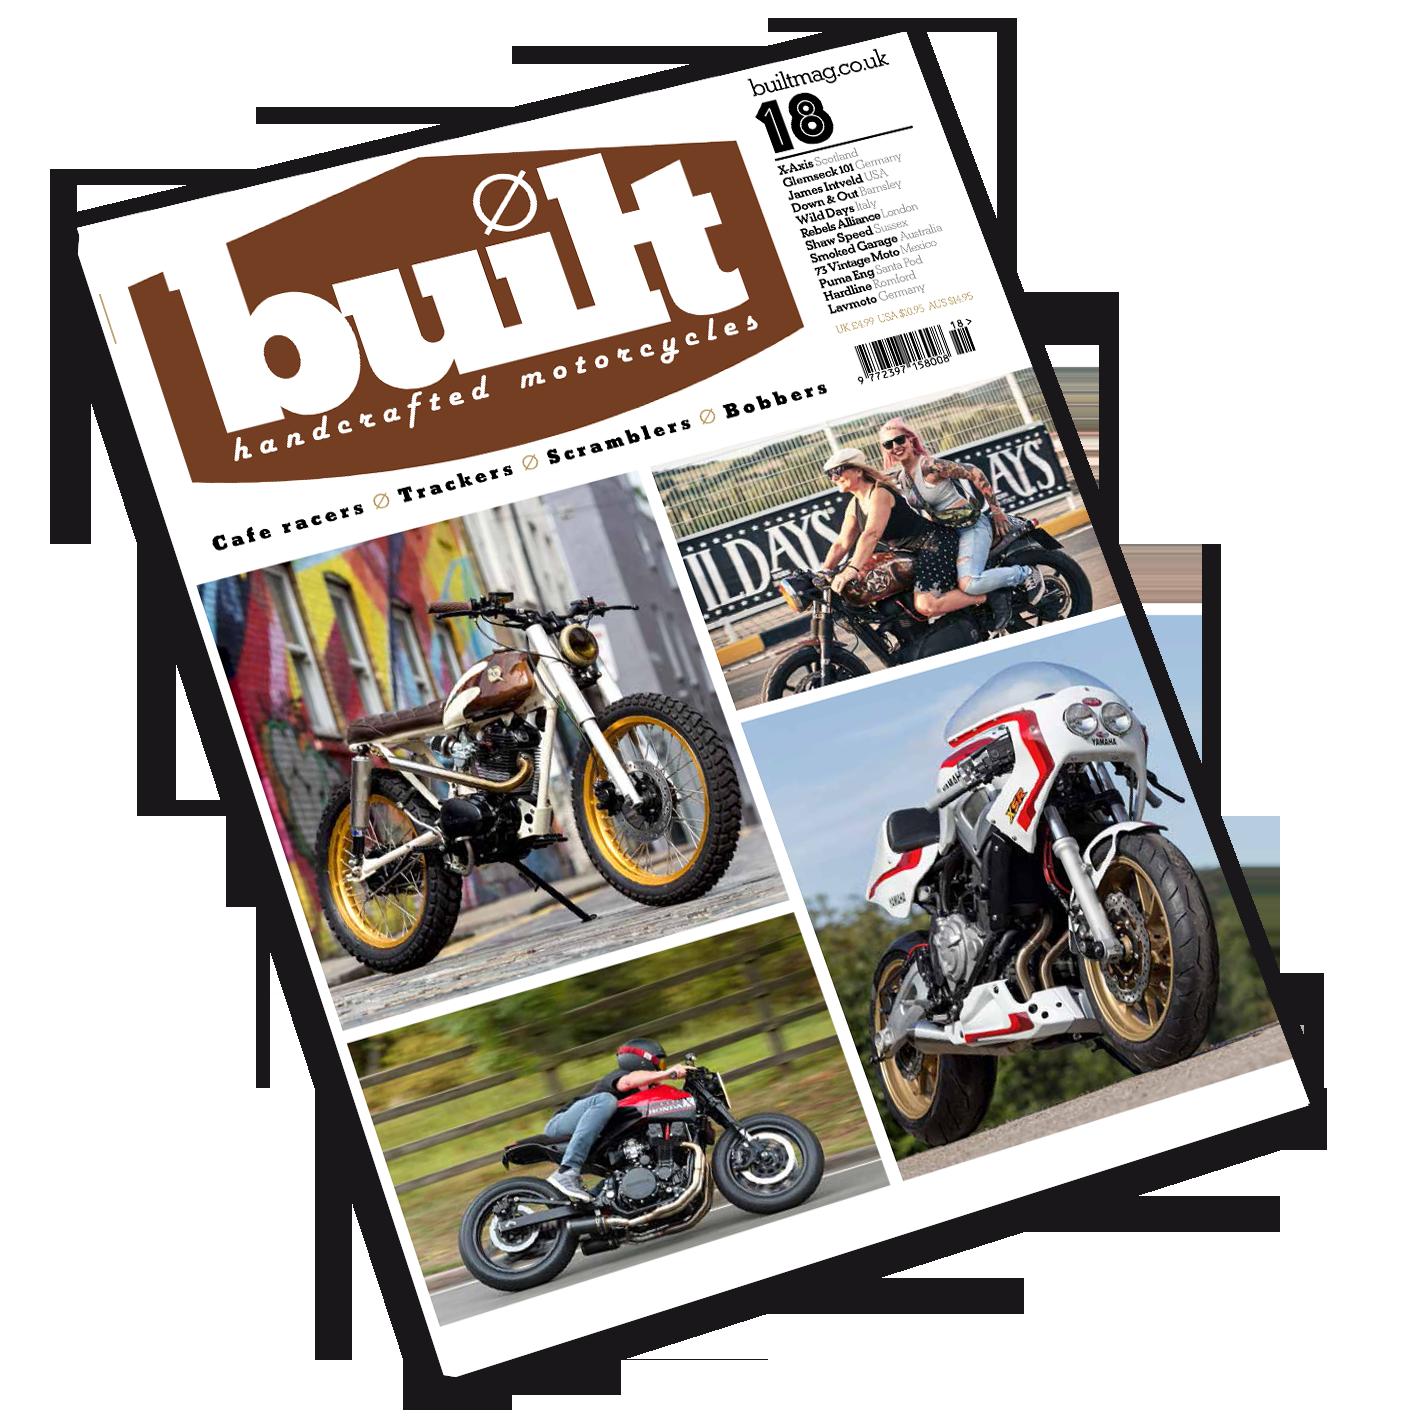 Built magazine issue 18